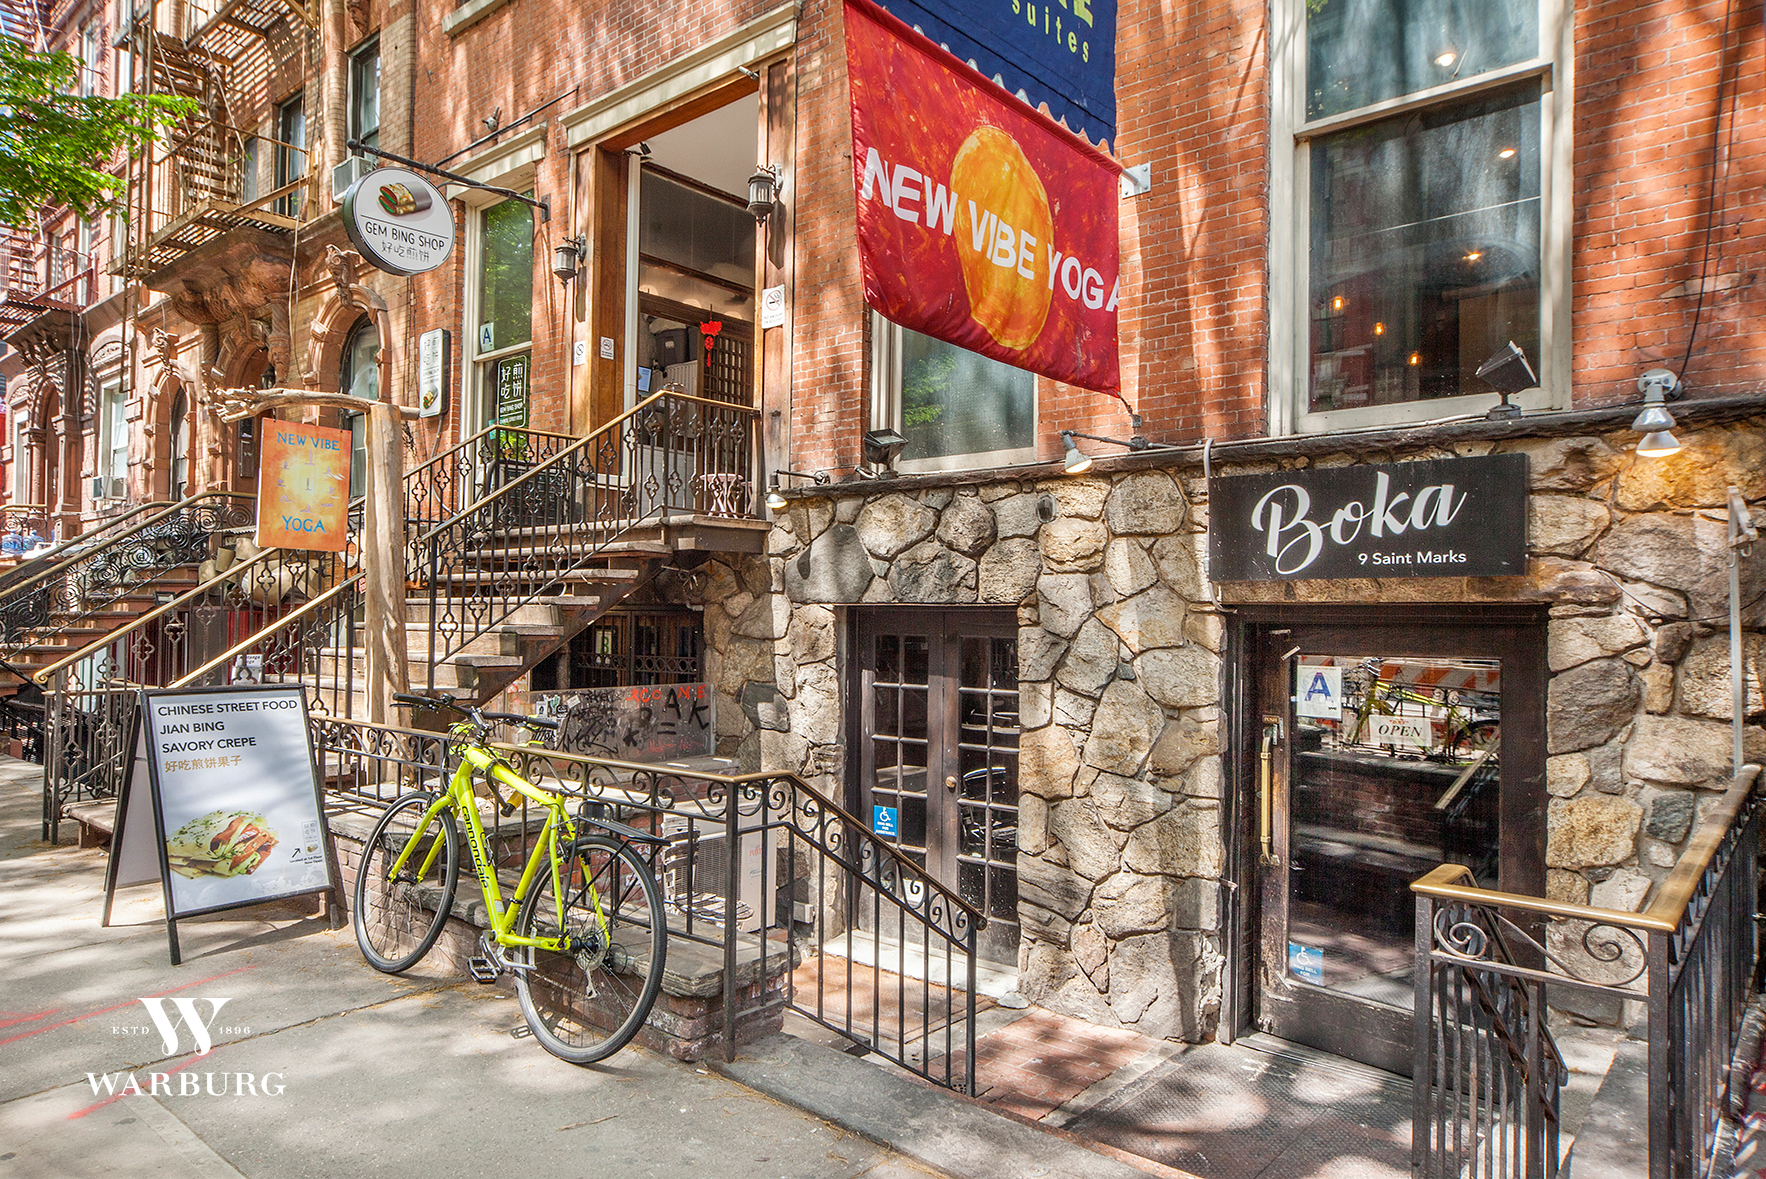 9 Saint Marks Place E. Greenwich Village New York NY 10003